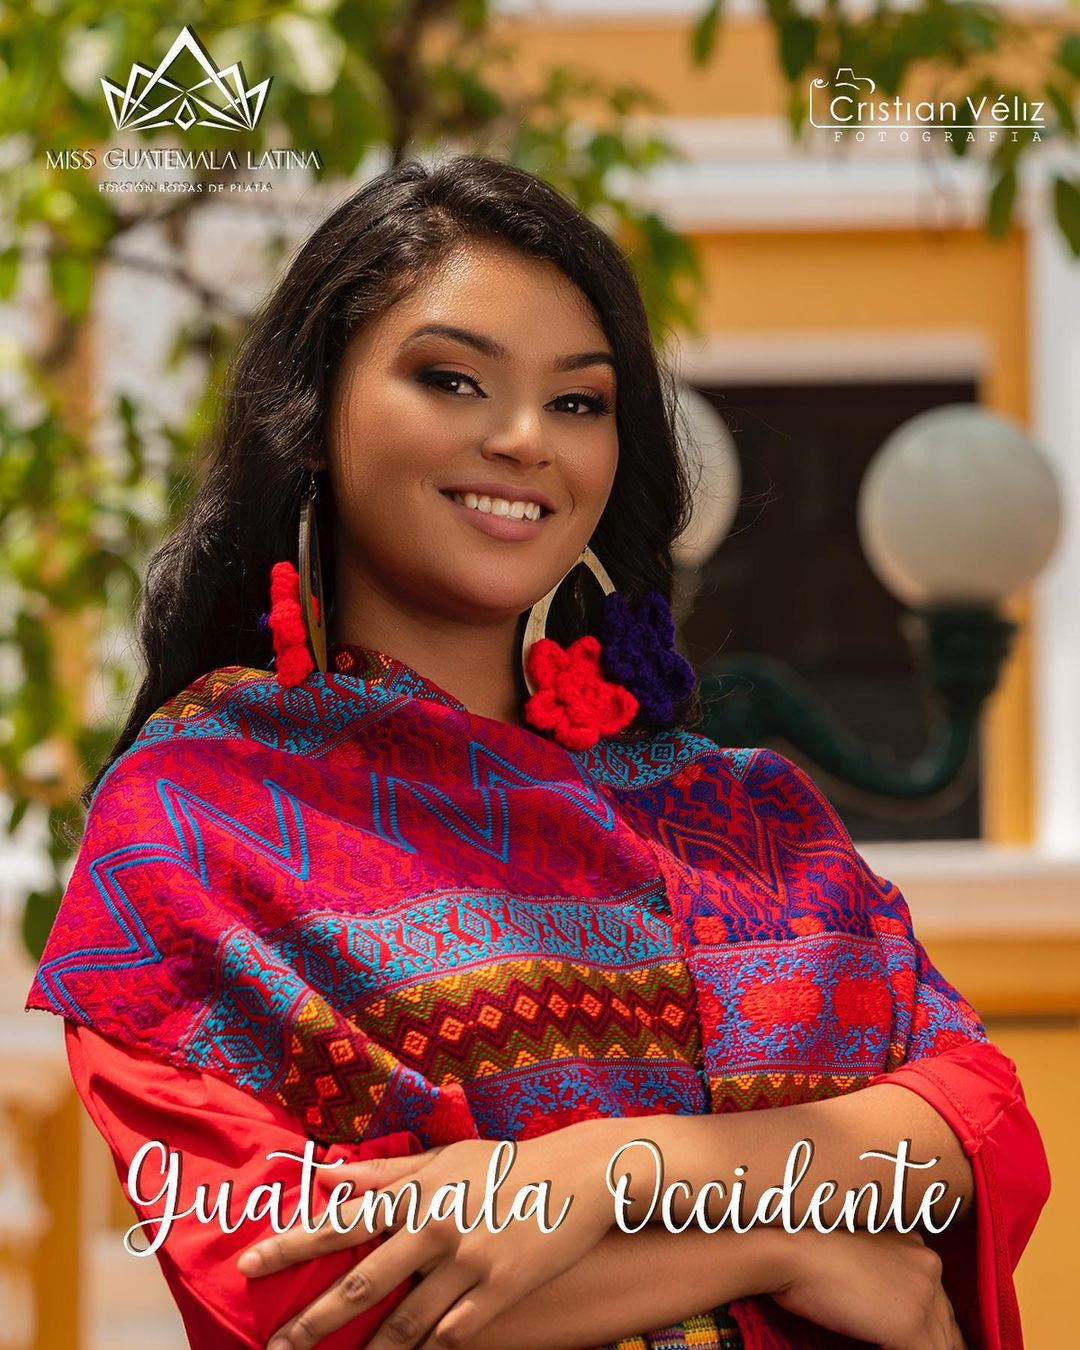 candidatas a miss guatemala latina 2021. final: 30 de abril. - Página 2 B2gGrx